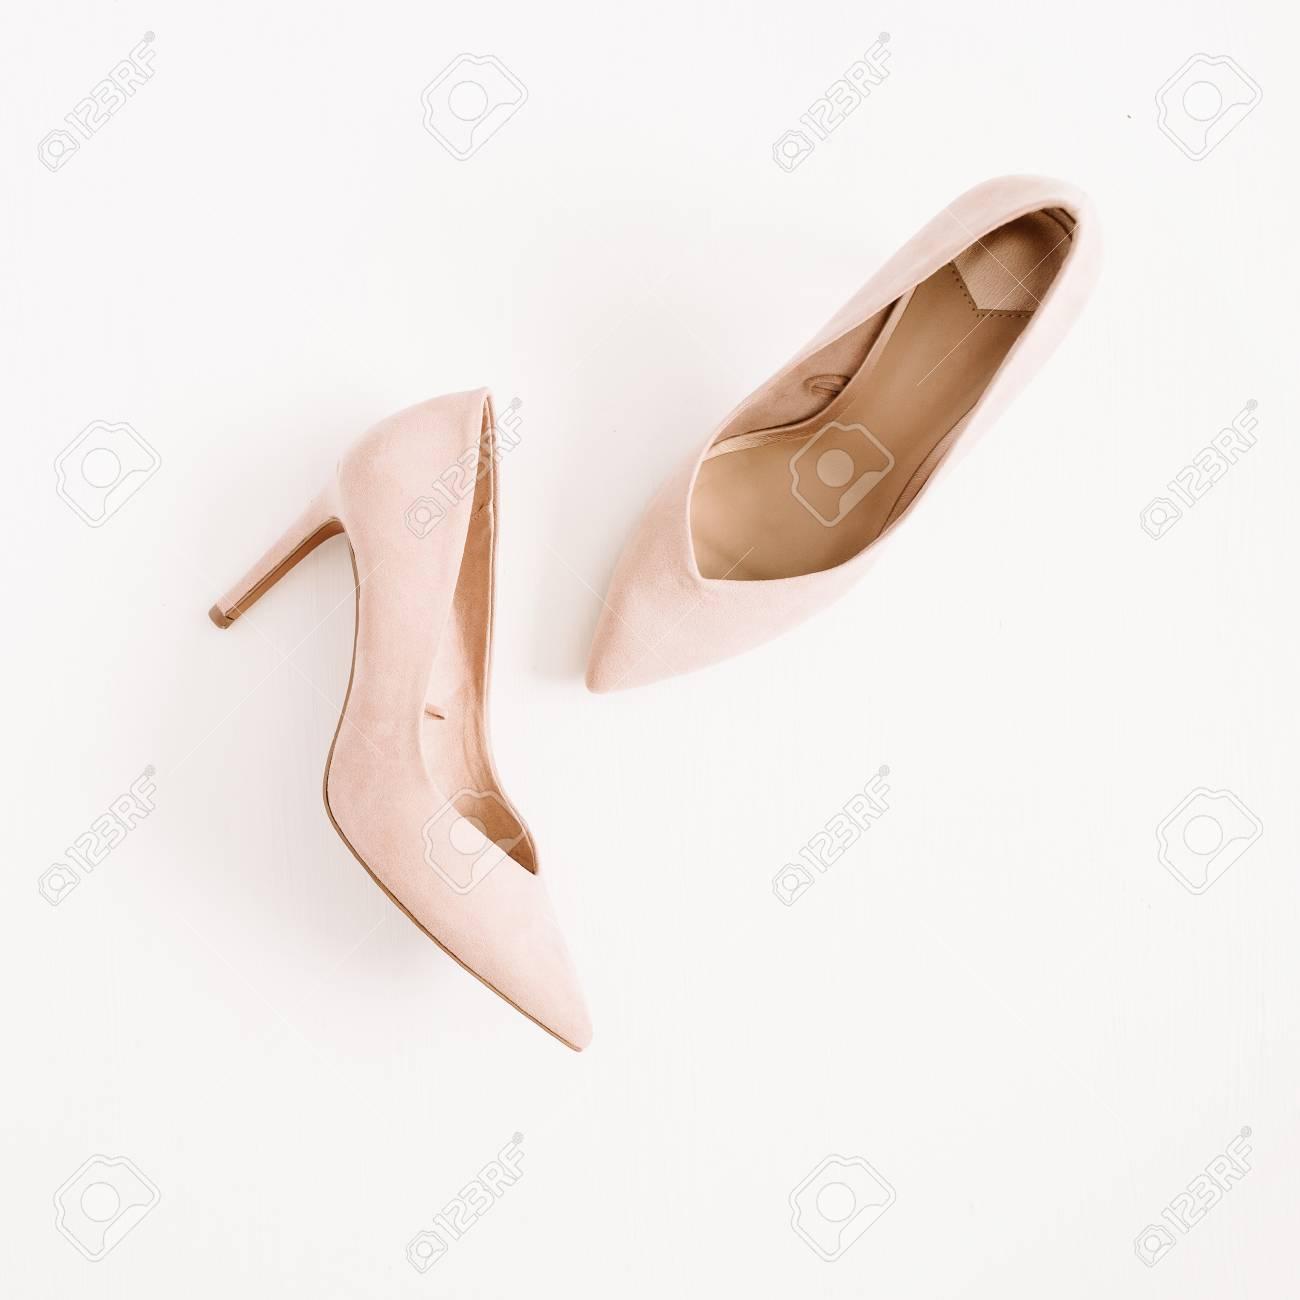 Fashion Blog Concept. Pale Pink Women